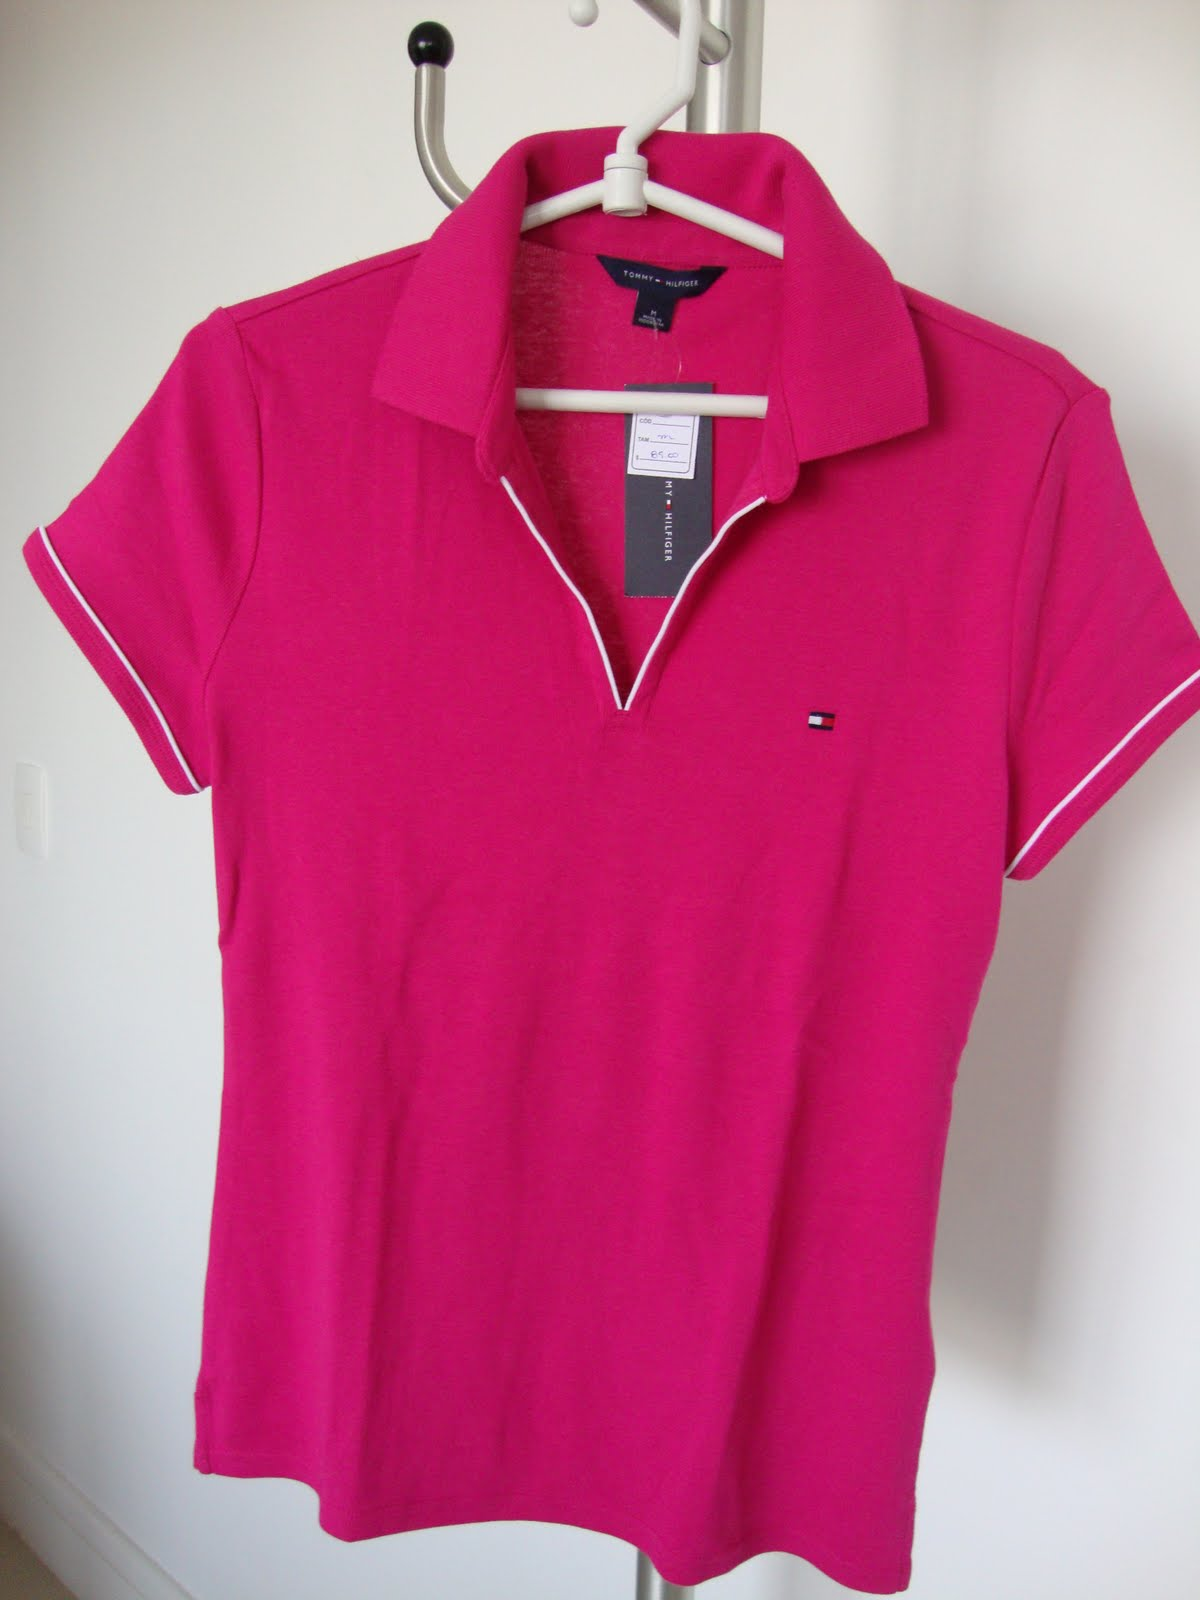 imports sale  Polo Feminina - Tommy hilfiger 7aed1e2d88d60